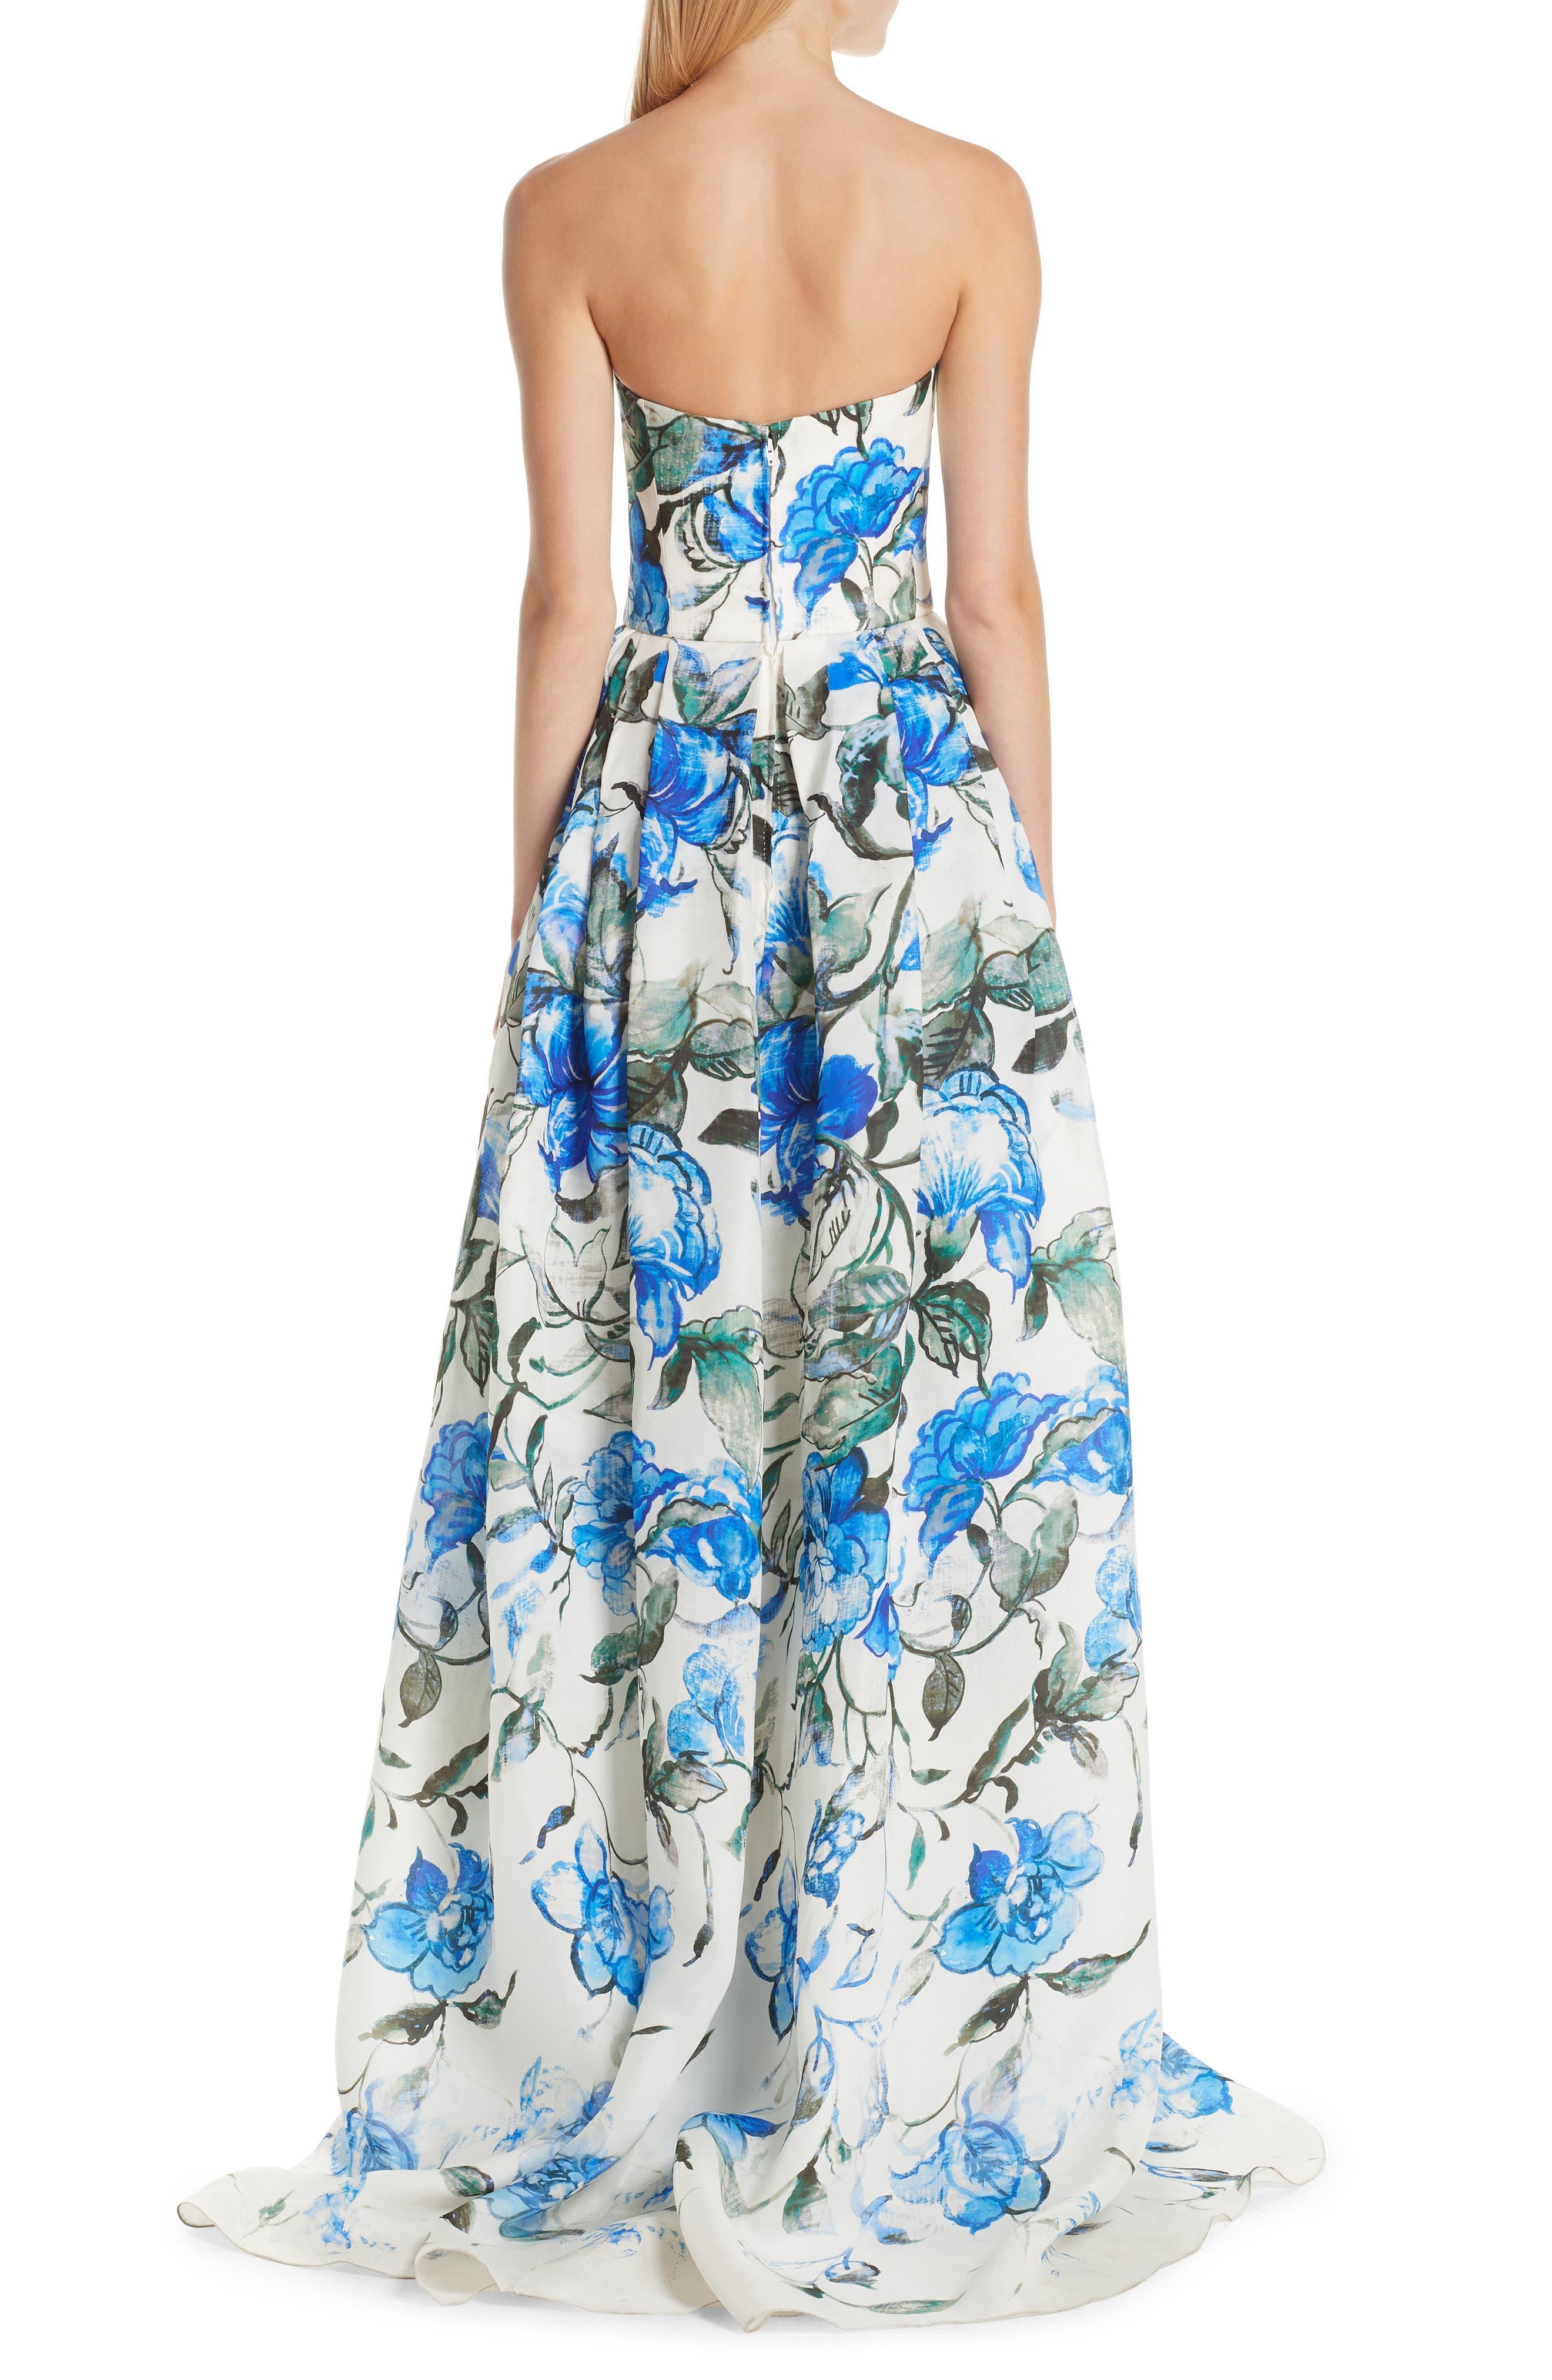 Floral Strapless Silk Evening Dress,                             Alternate thumbnail 2, color,                             PERSIAN BLUE MULTI